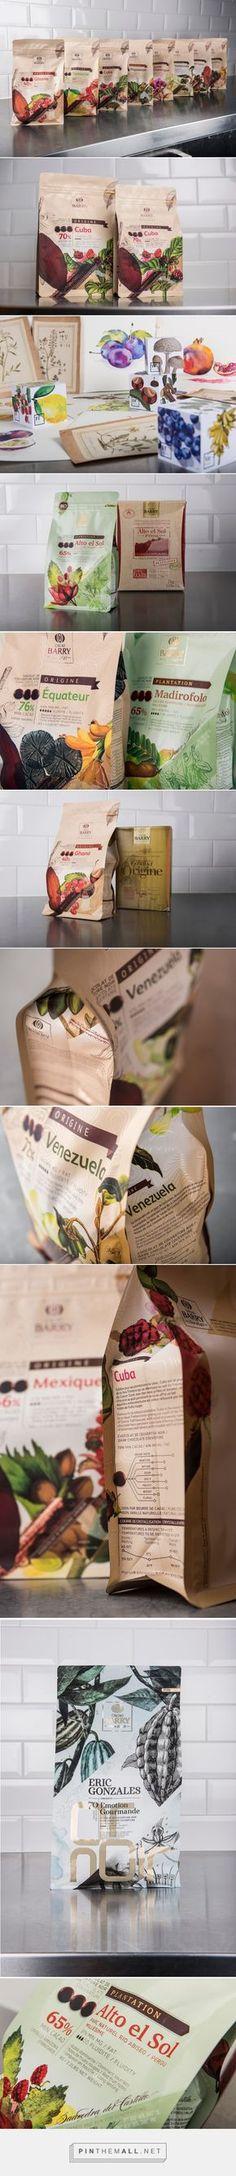 Cacao Barry packaging designed by DesignBridge  - http://www.packagingoftheworld.com/2015/09/cacao-barry.html